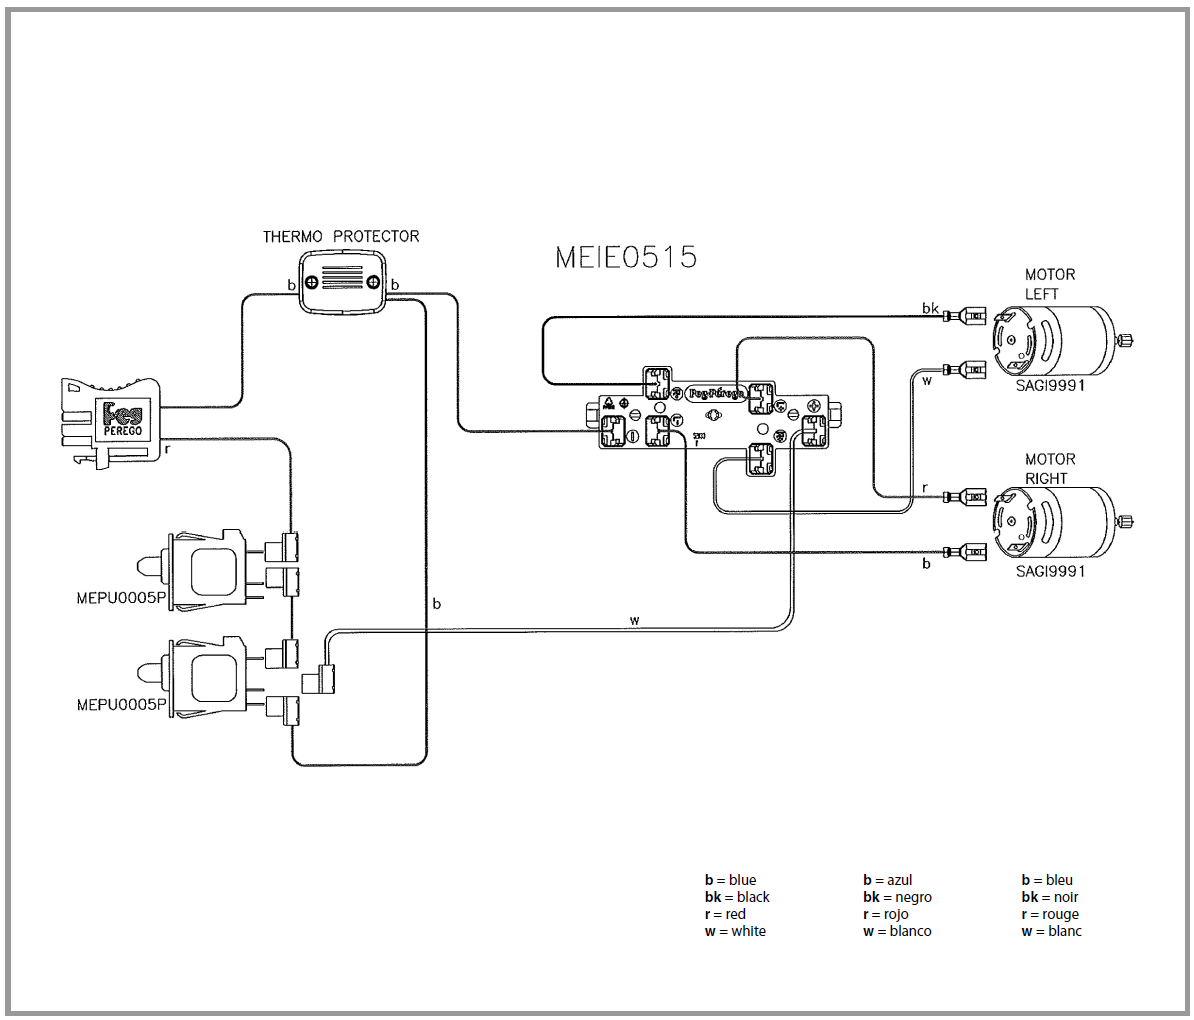 hight resolution of peg perego rzr 900 wiring diagram